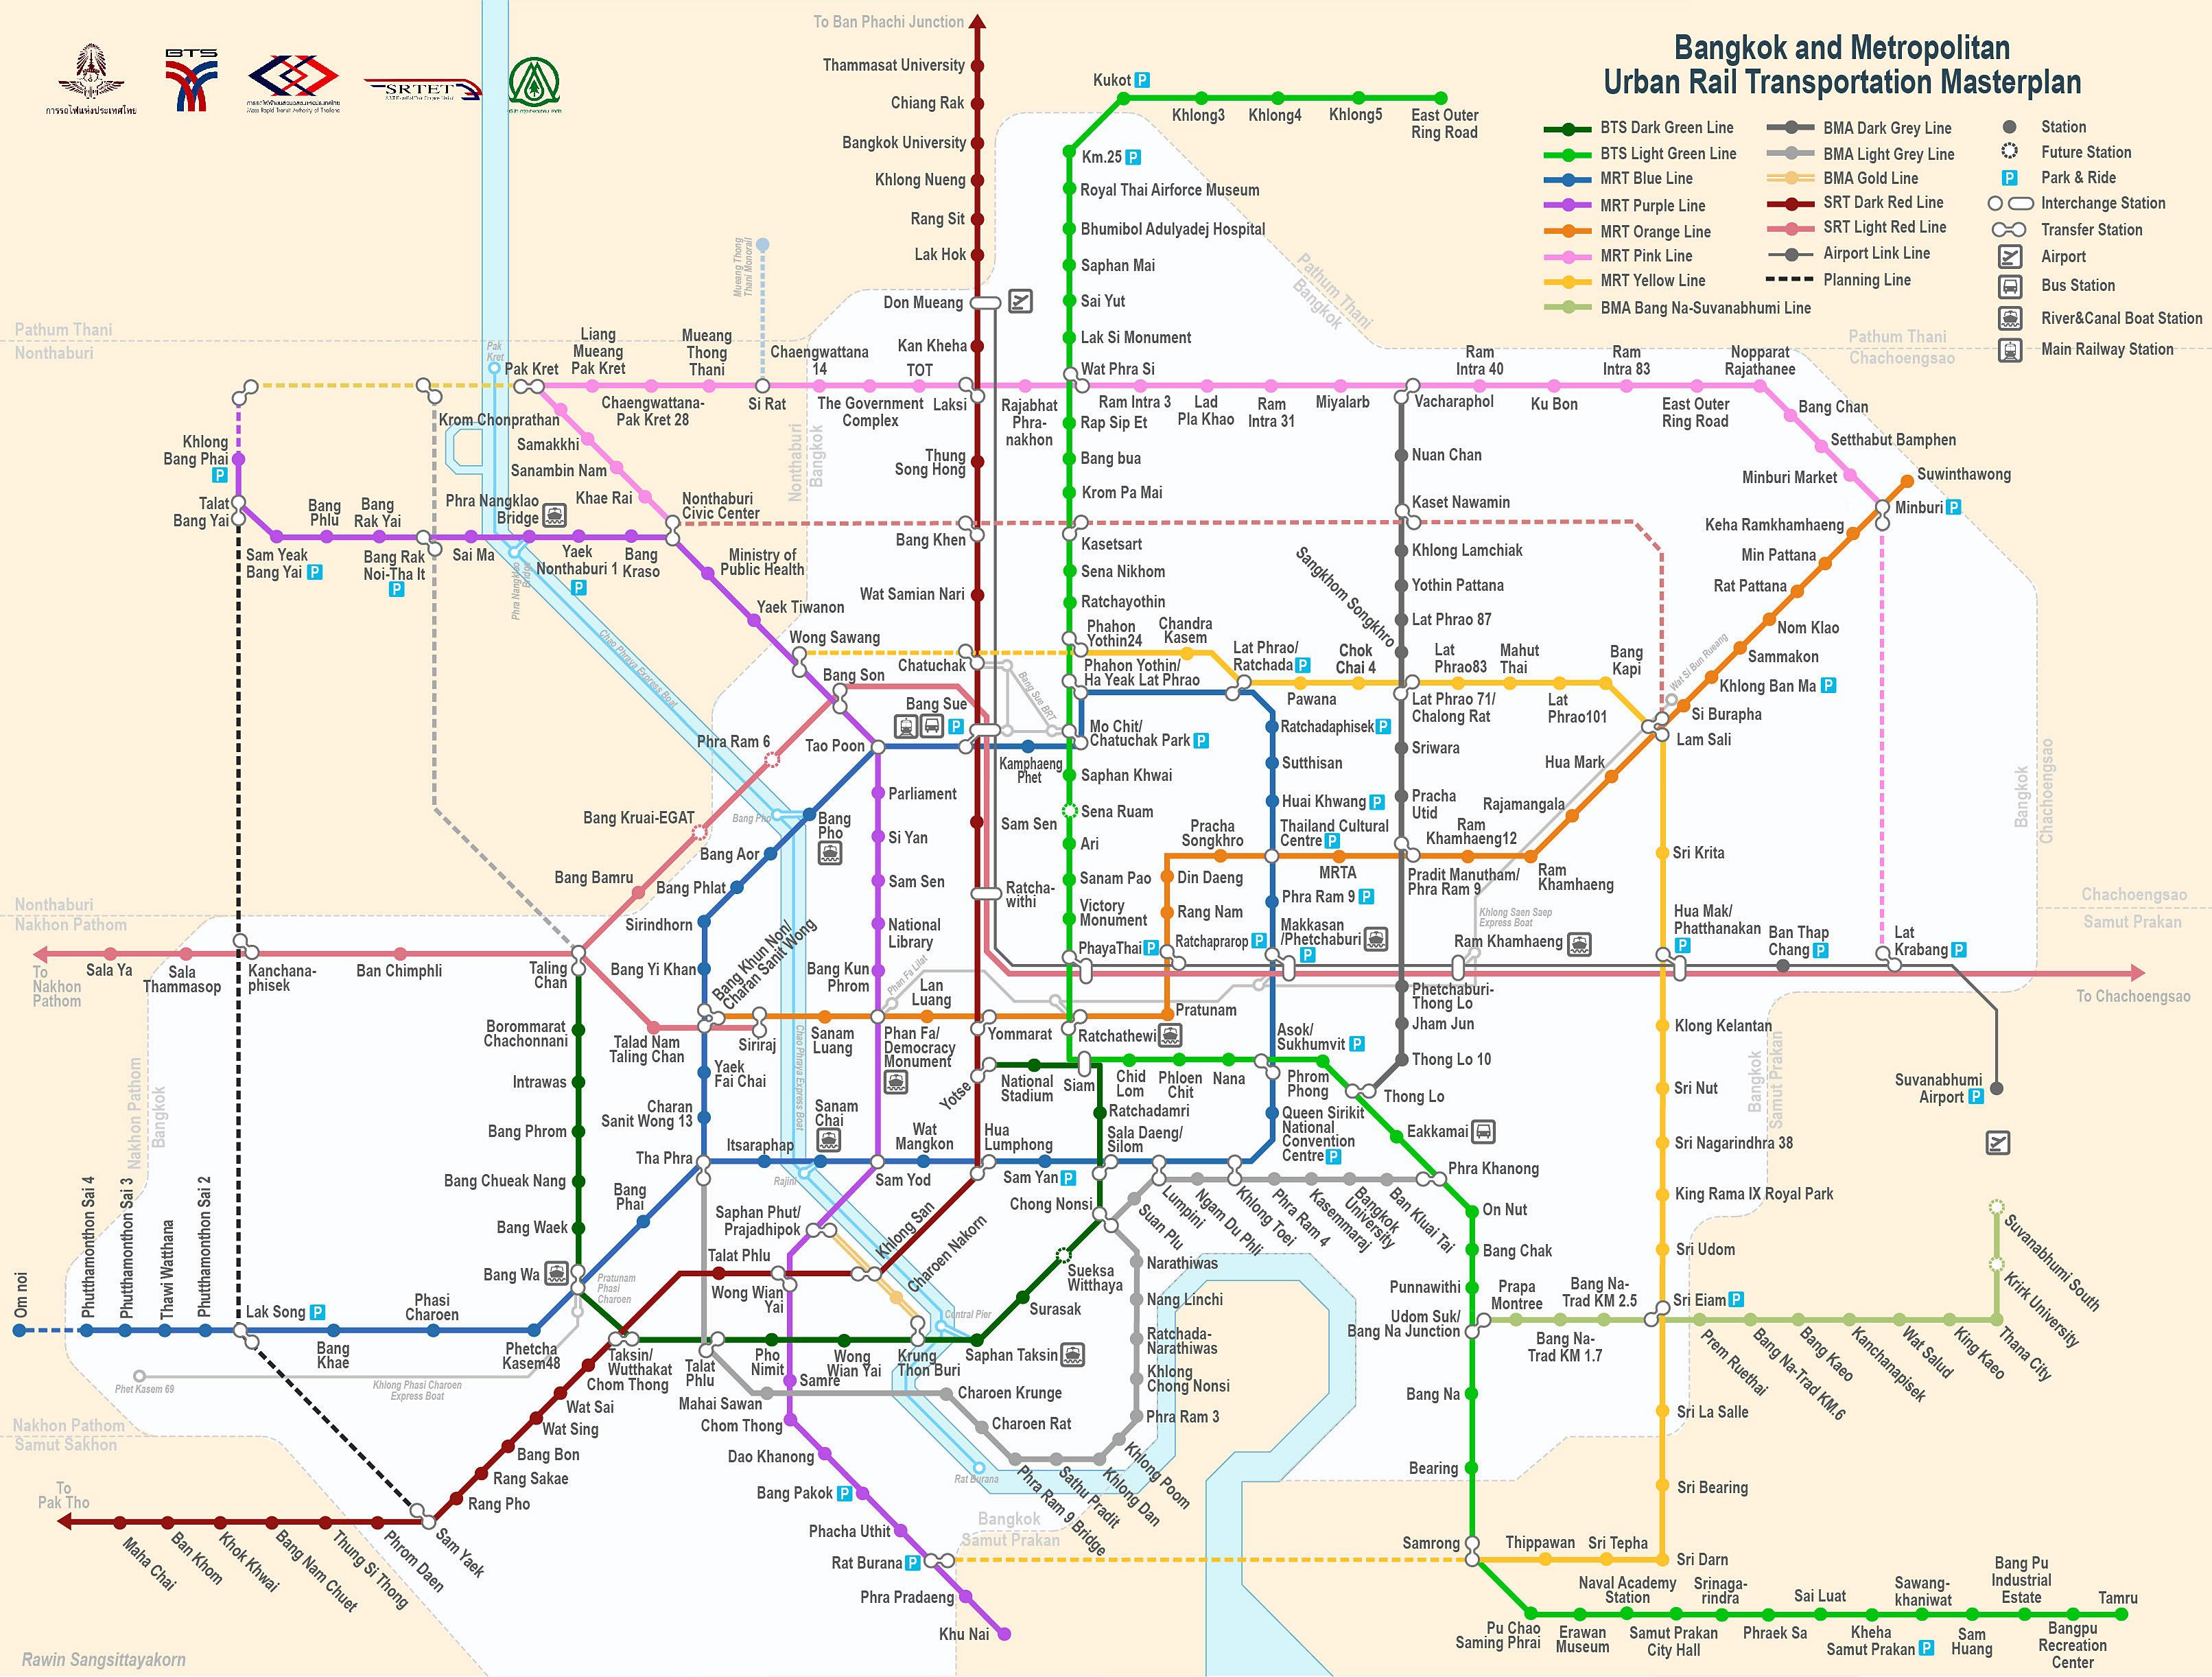 Bangkok Transport phase2 Jan 2017 a.jpg